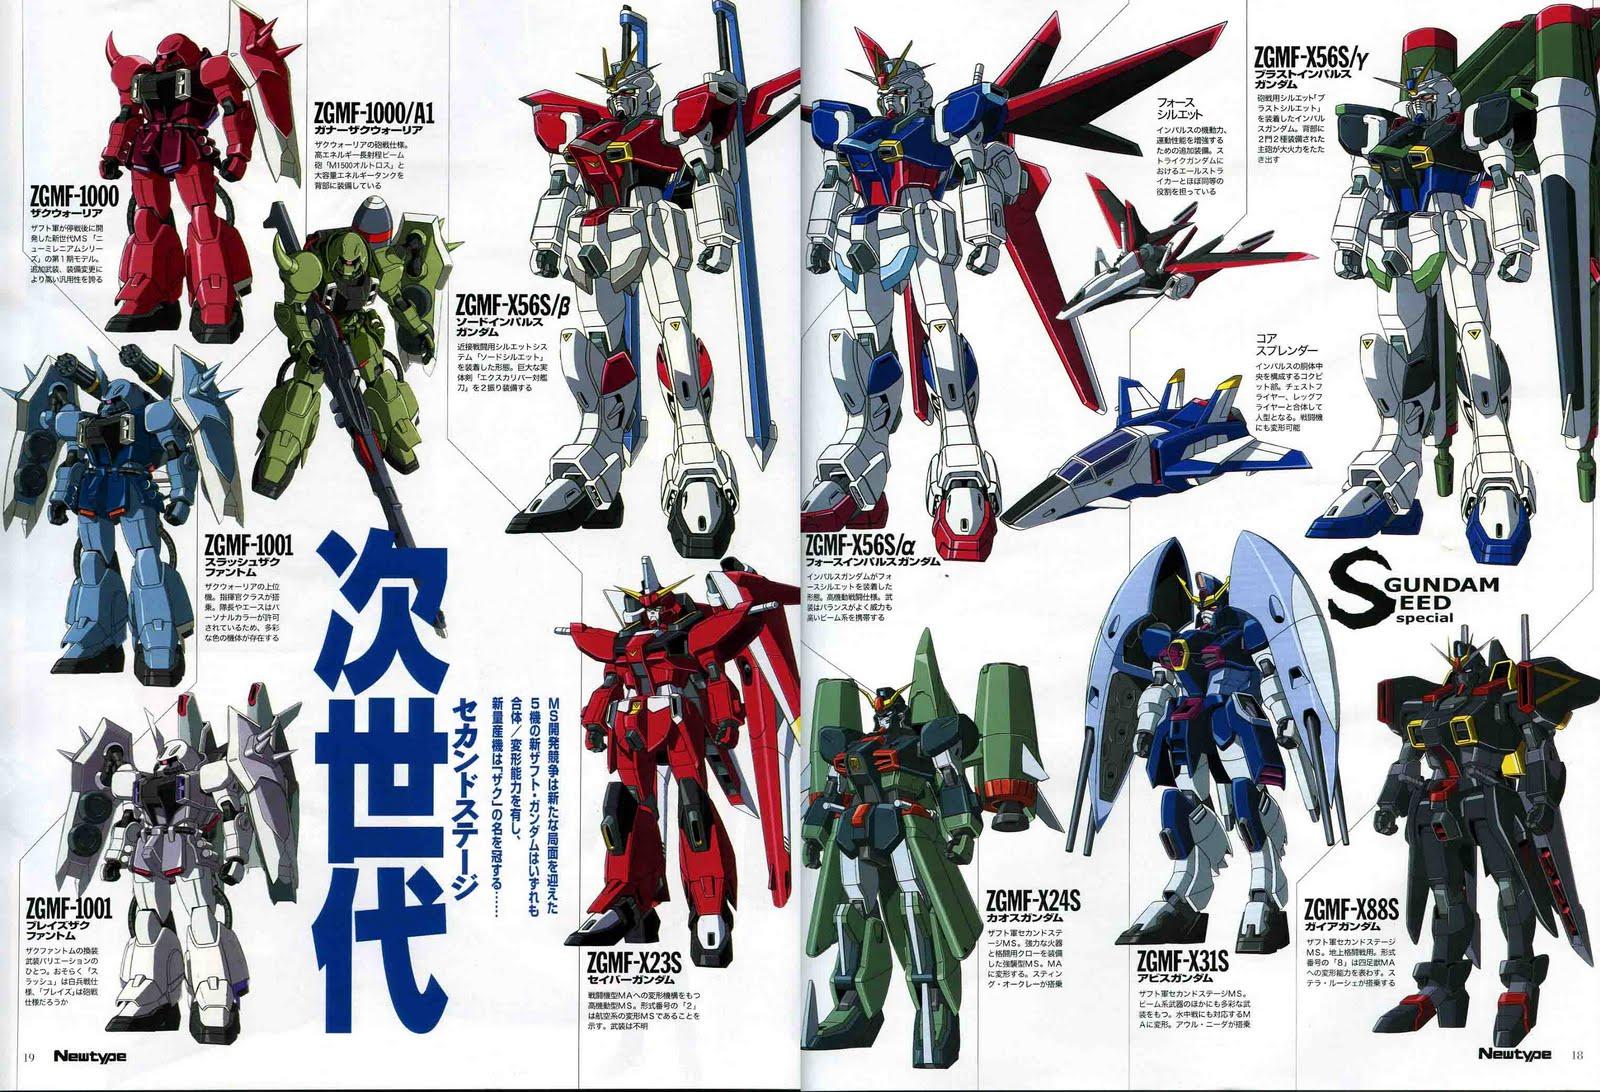 Cartoon Gundam Seed Destiny Wallpaper 1600x1092 Full HD Wallpapers 1600x1092